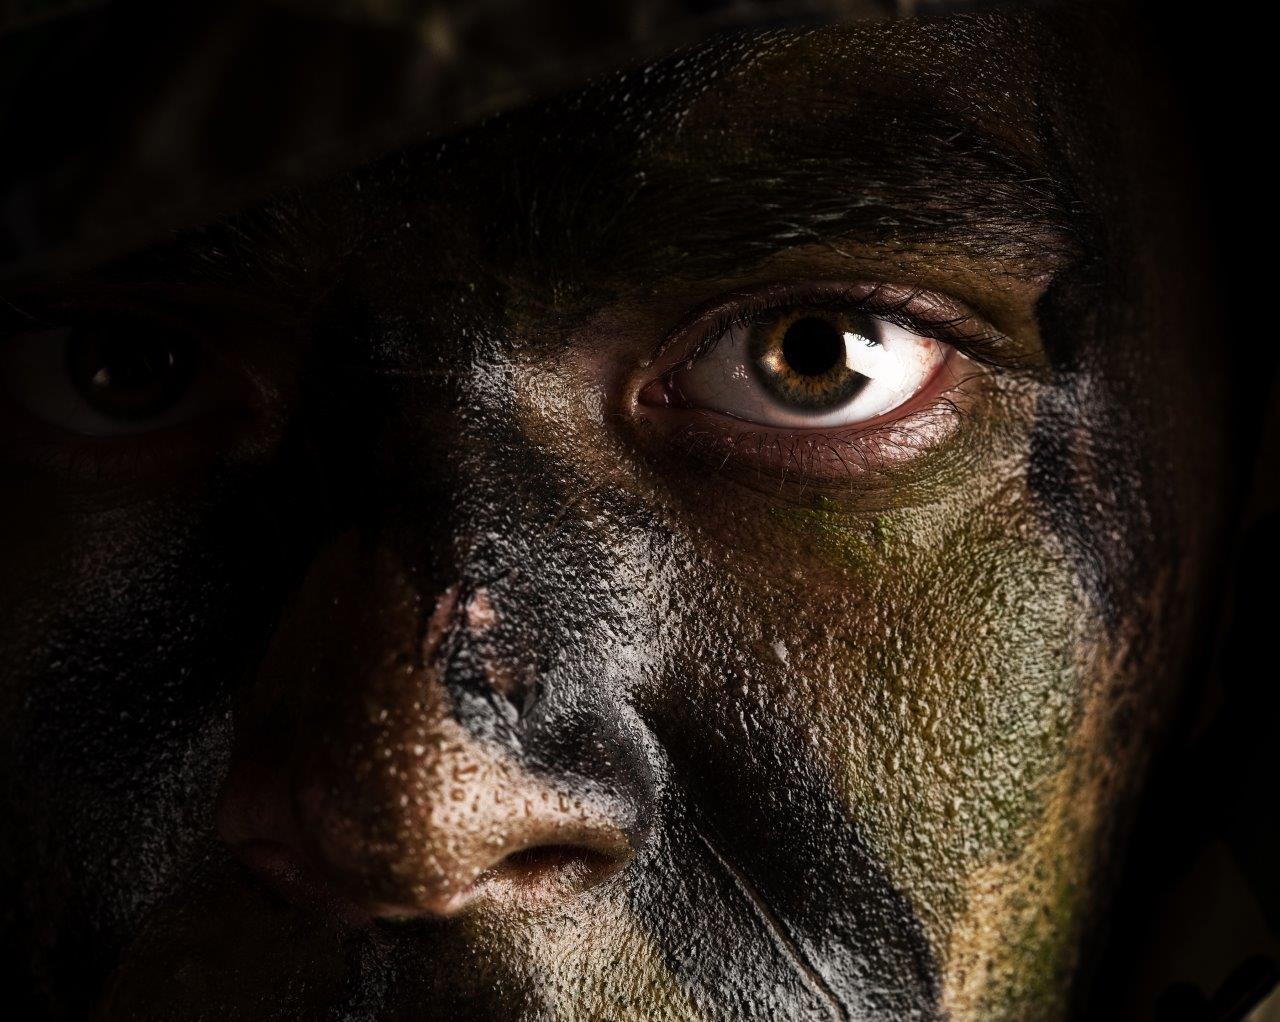 Top 10 Portrait Photography Composition Tips